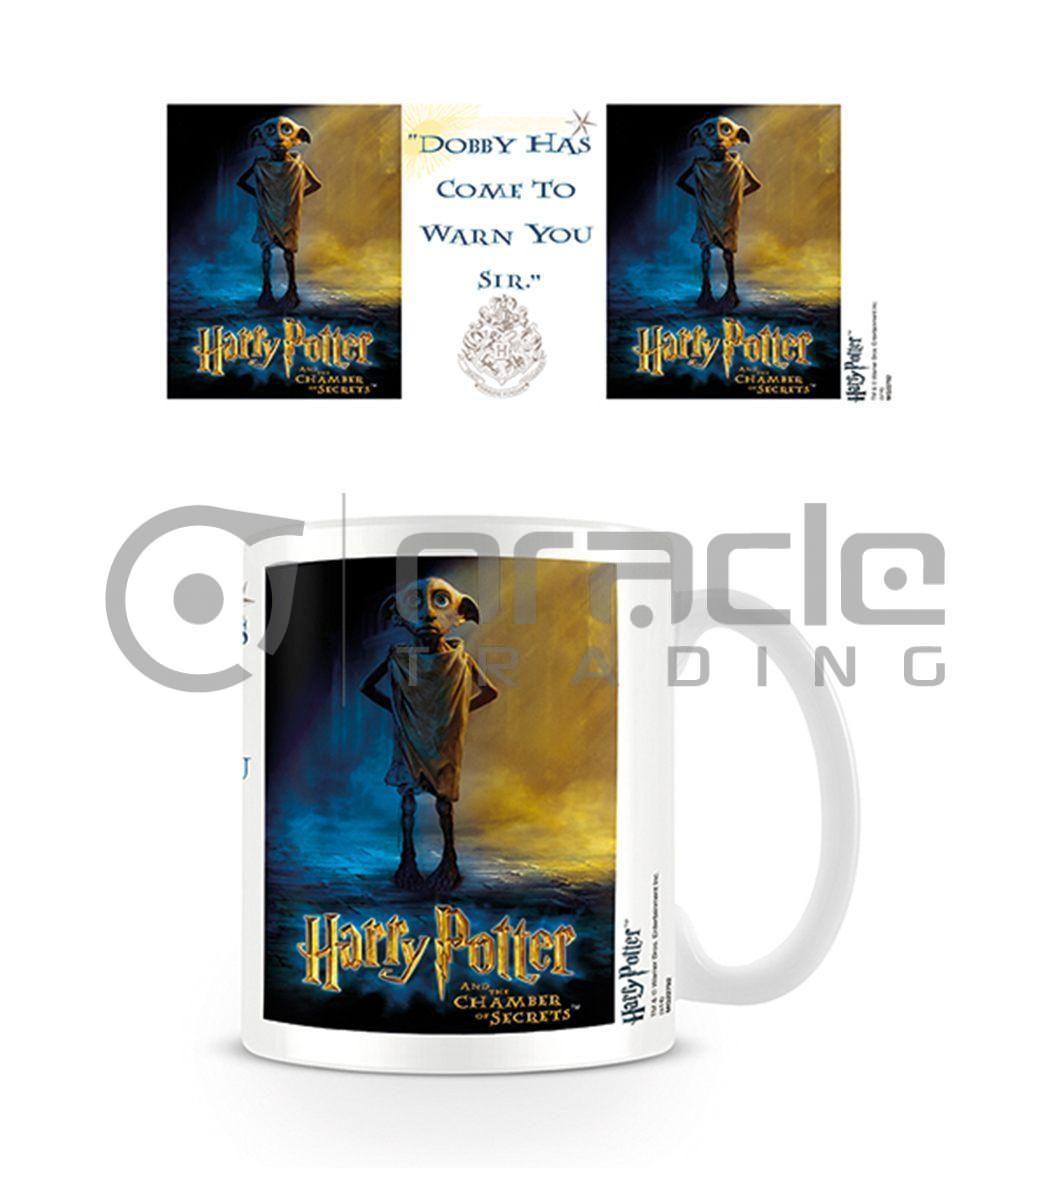 Harry Potter Dobby Coffee Mug (Dobby's Warning)